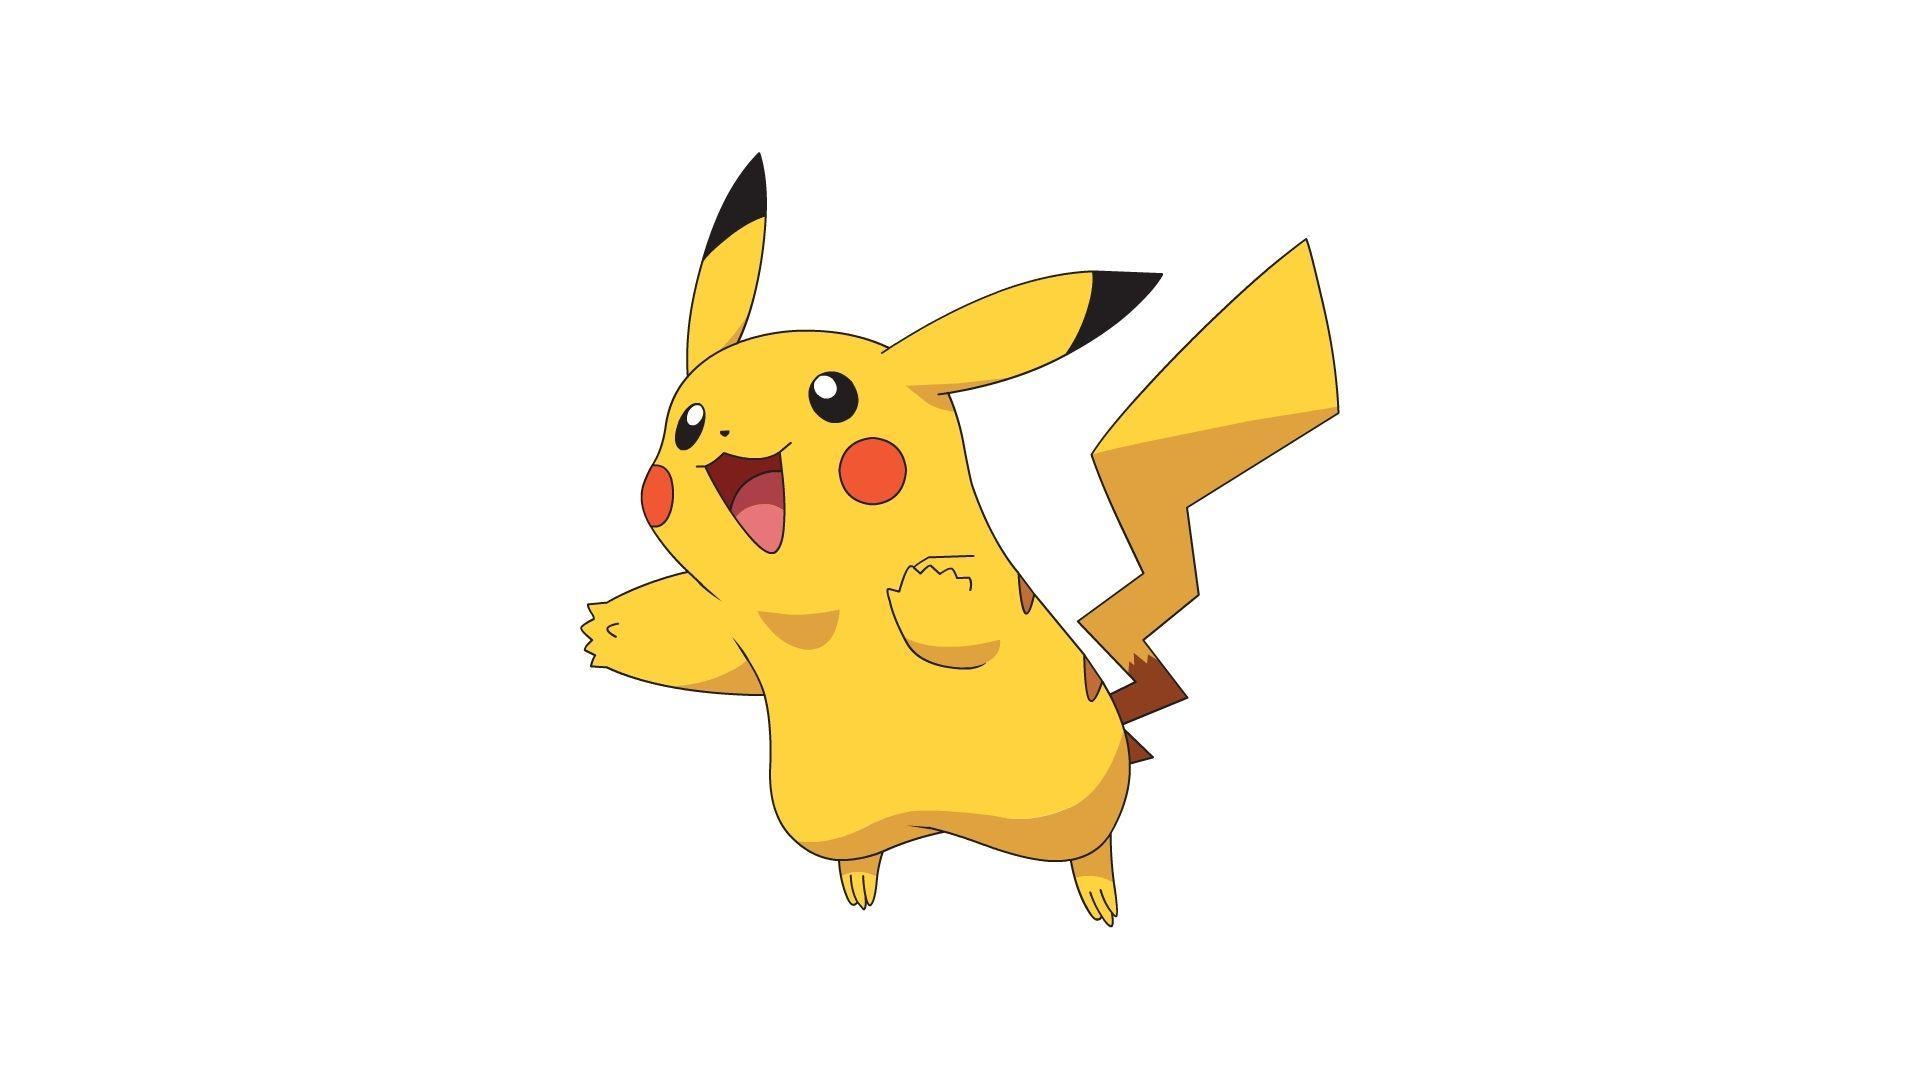 Pokemon Wallpapers Pikachu - Wallpaper Cave